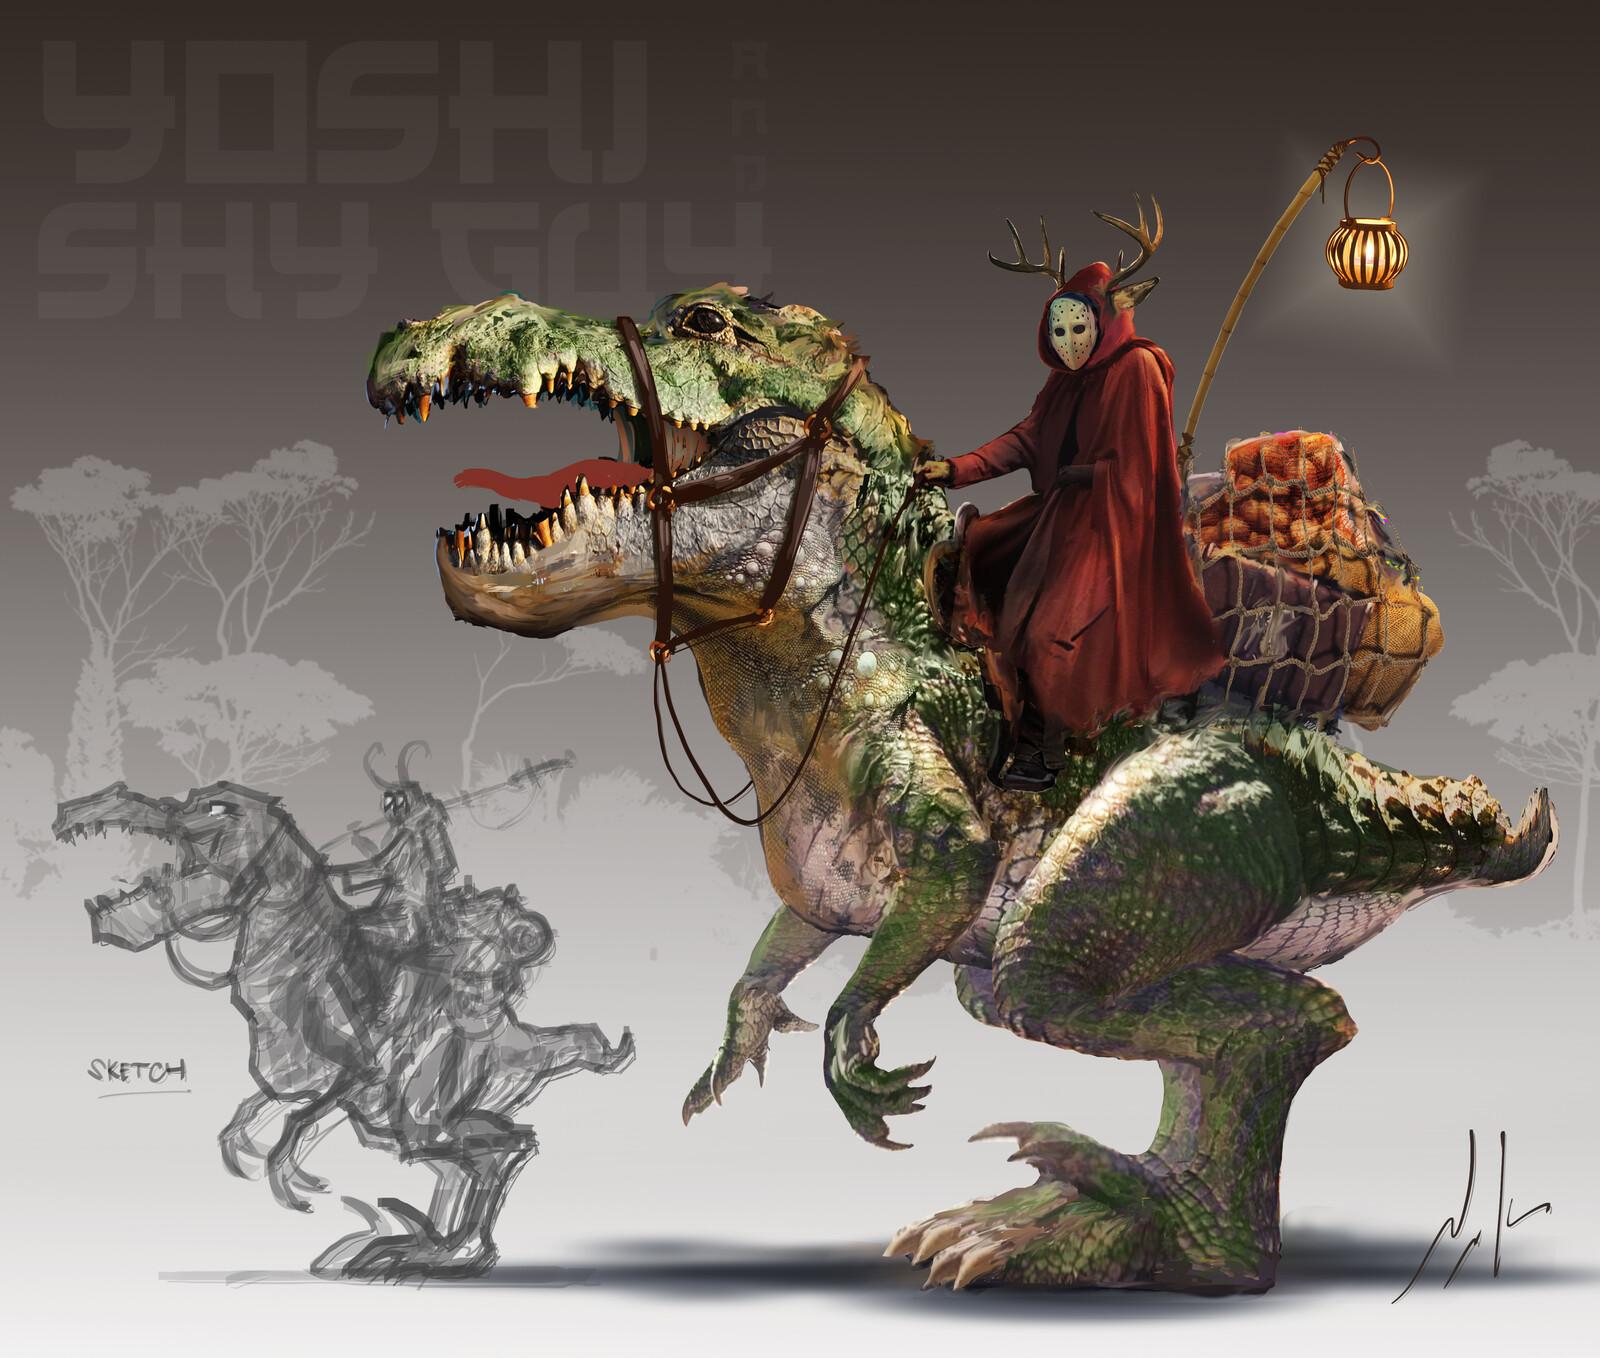 Yoshi and ShyGuy